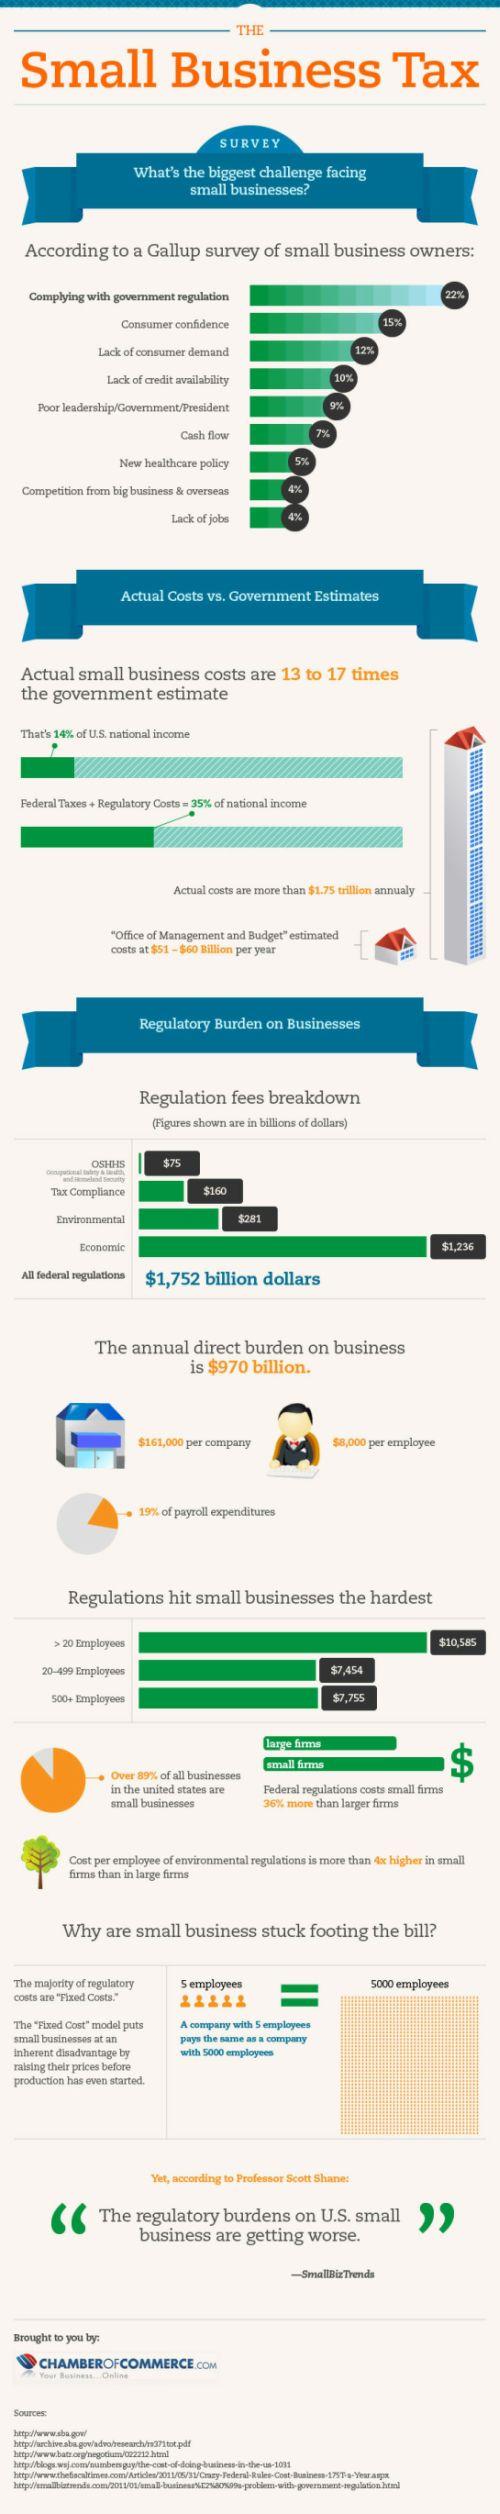 Small business regulatory burden infographic